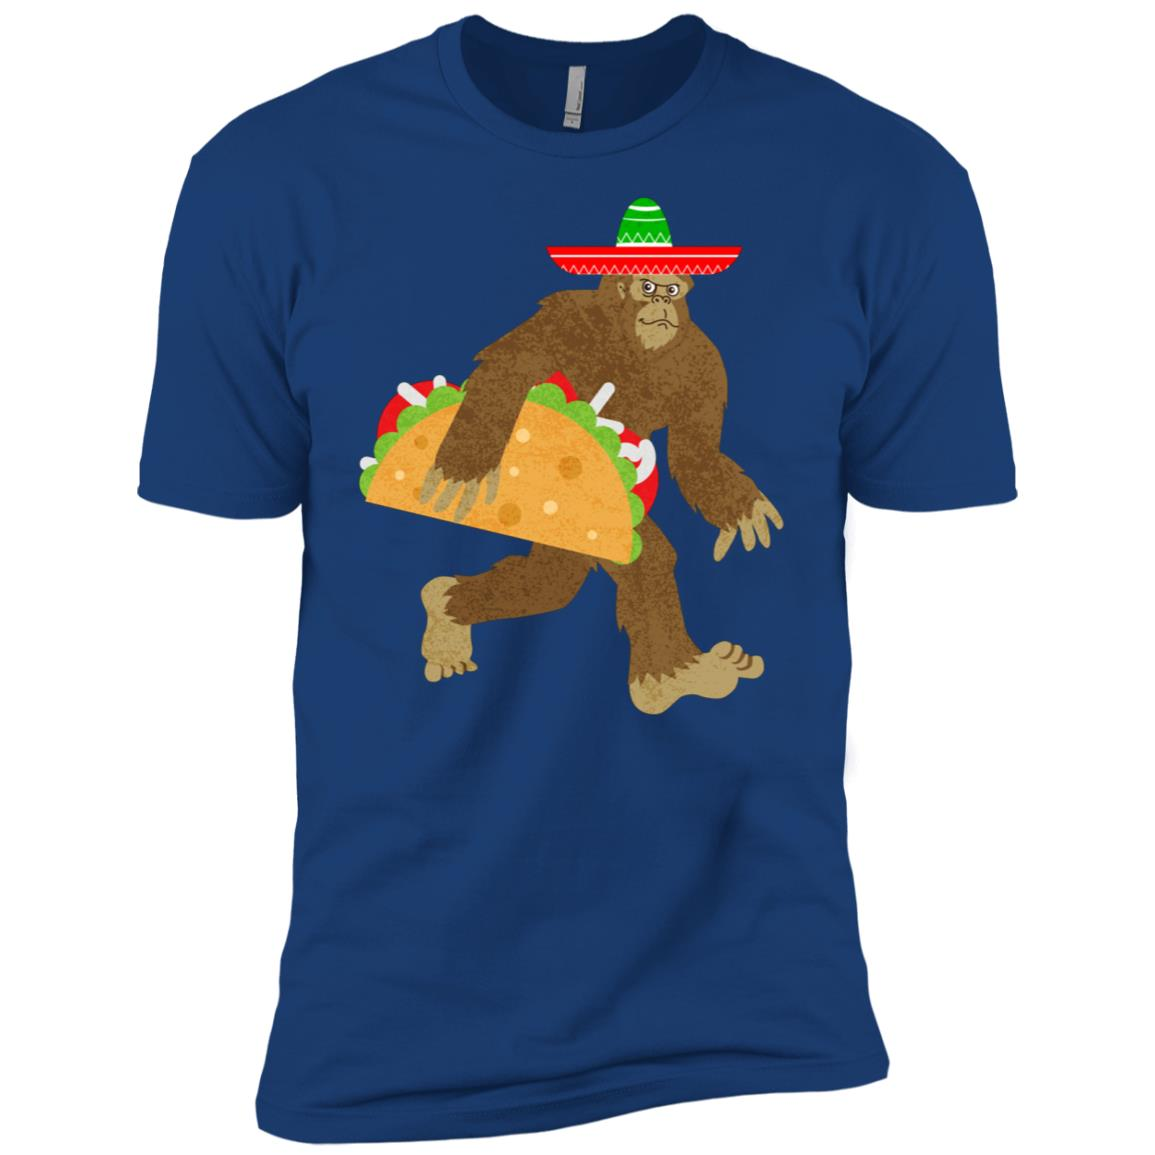 Funny Cinco De Mayo novelty for men women boys girls Men Short Sleeve T-Shirt